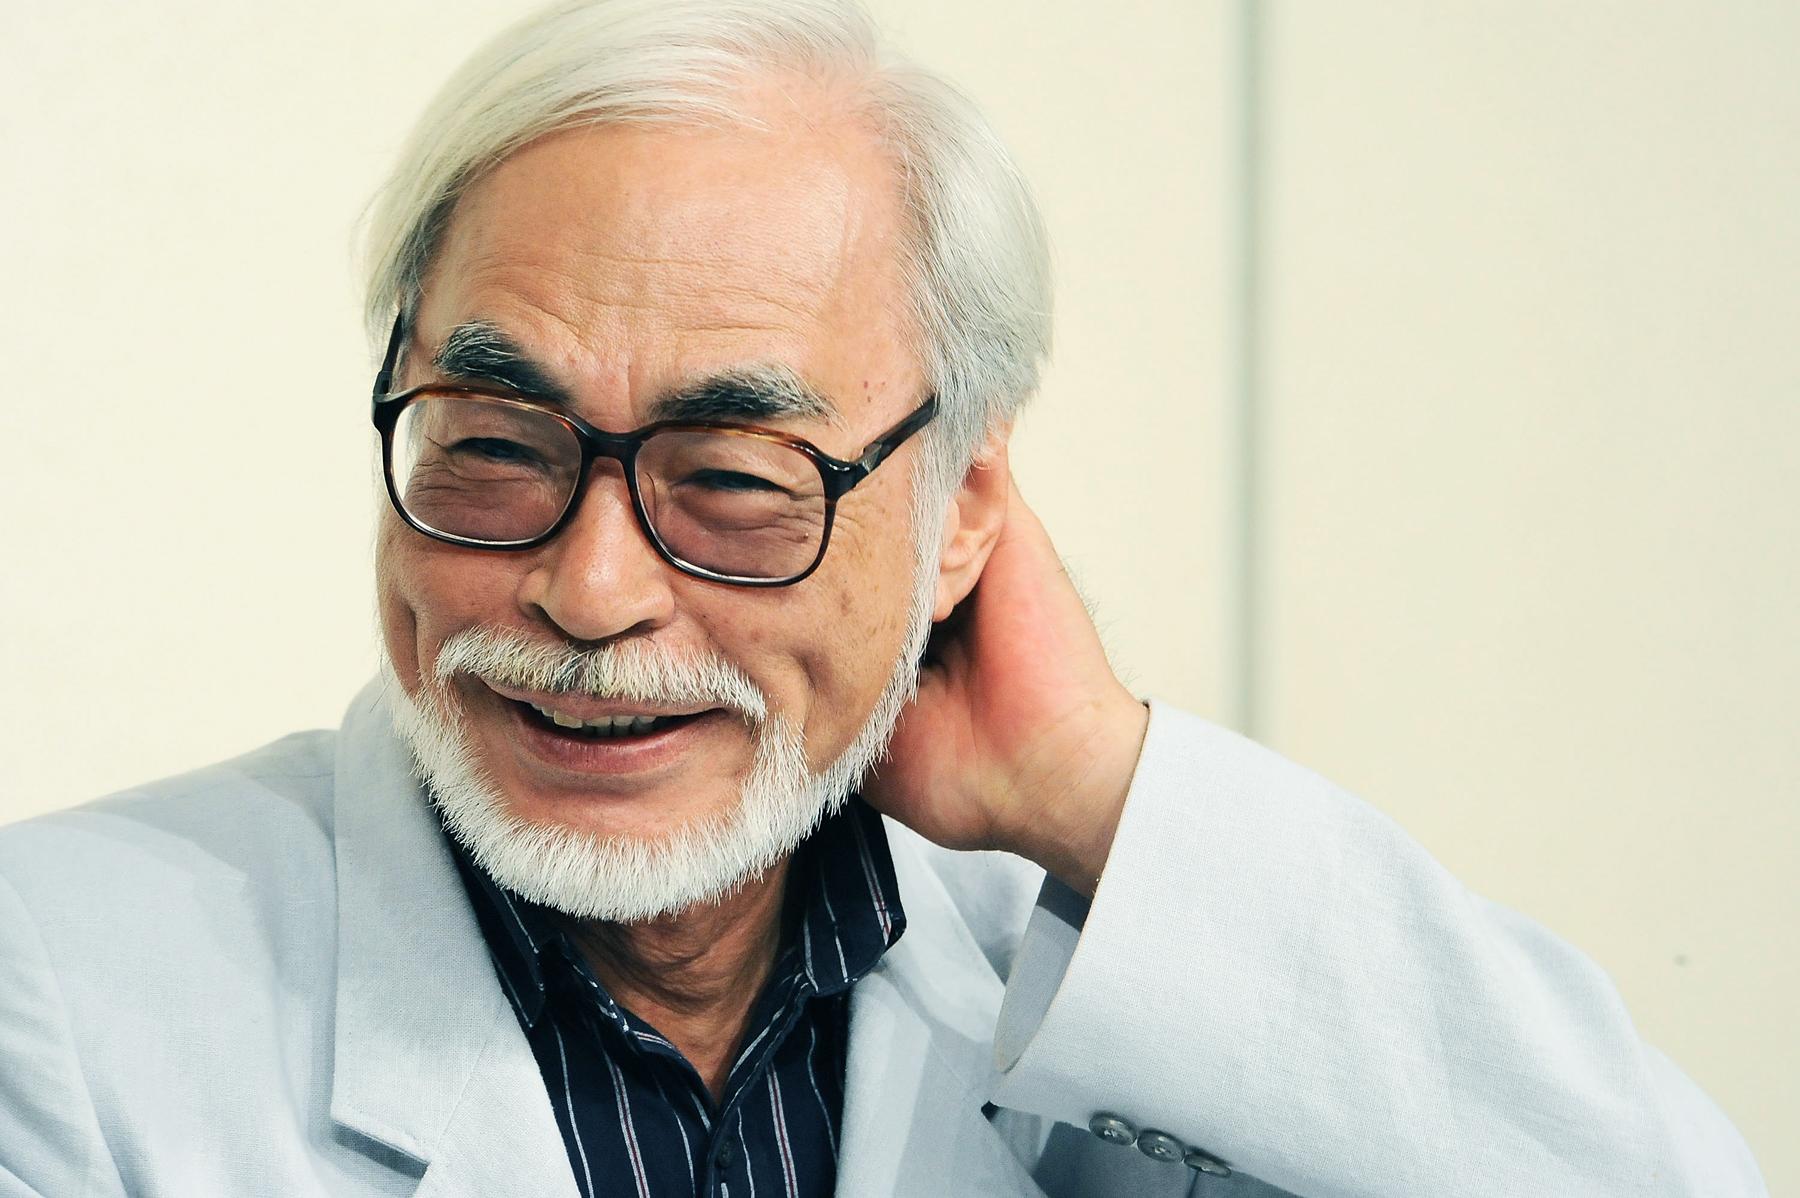 miyazaki-smiling.jpg